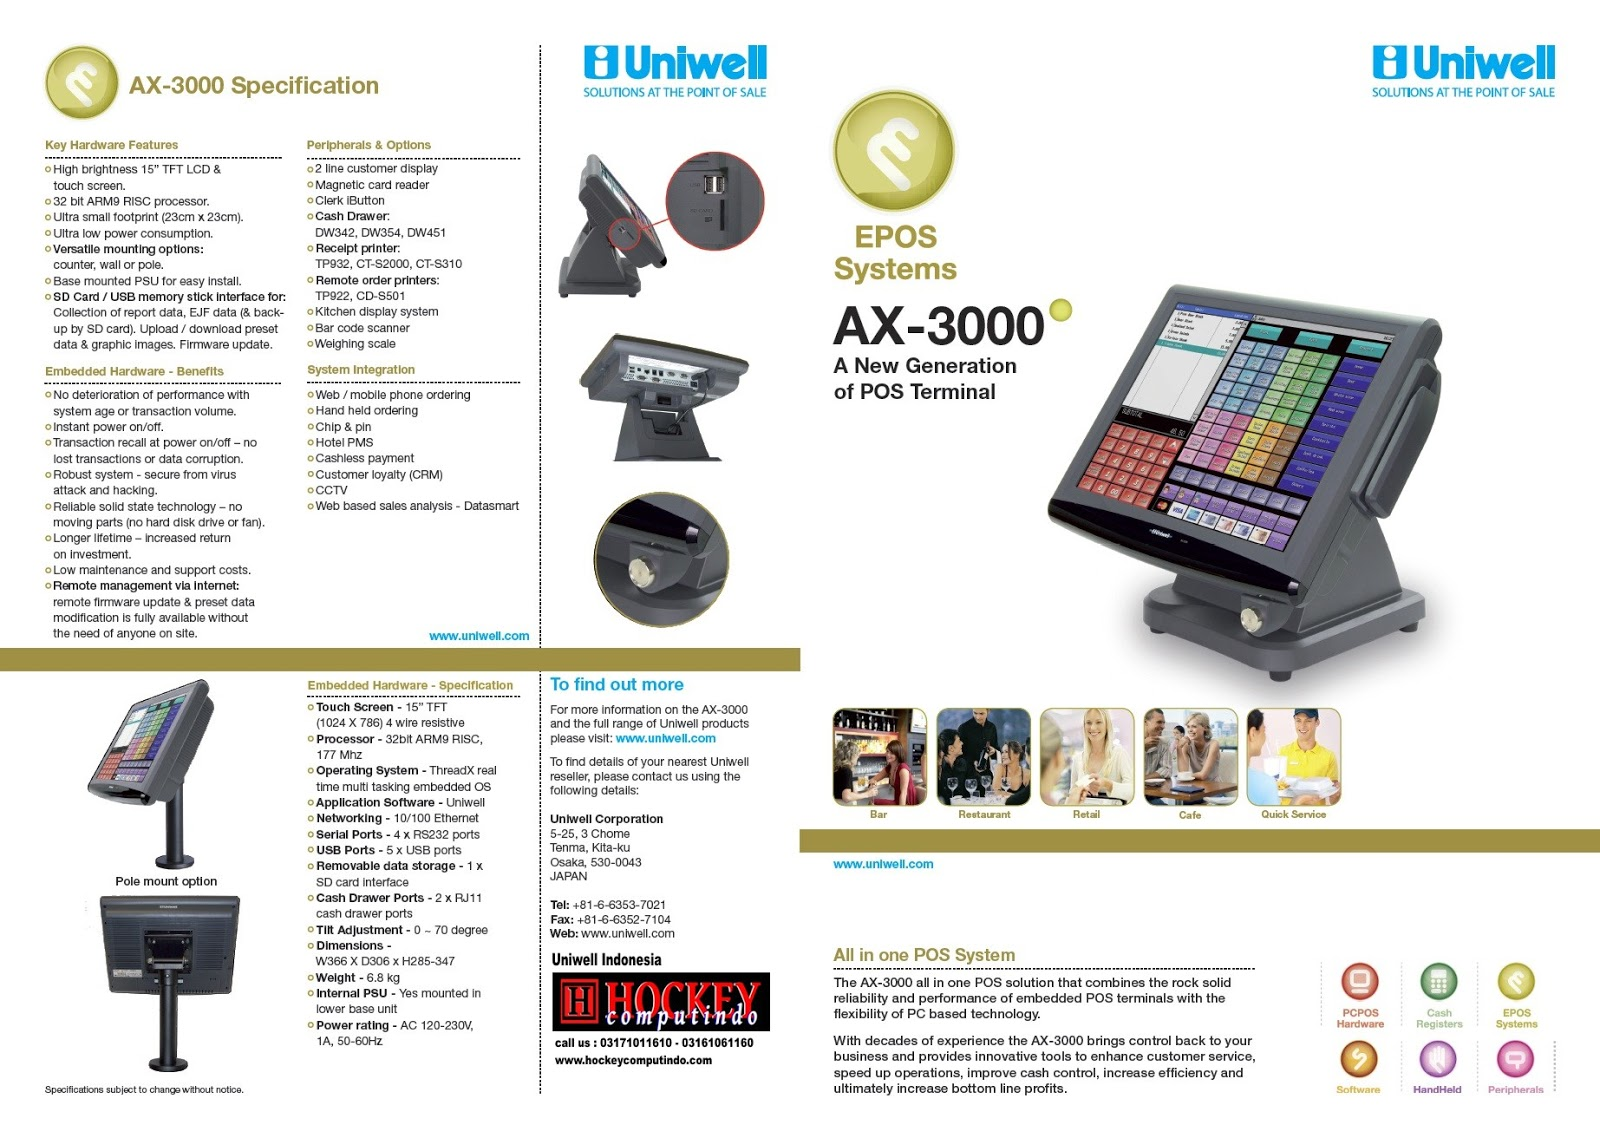 uniwell dx 895 programming manual